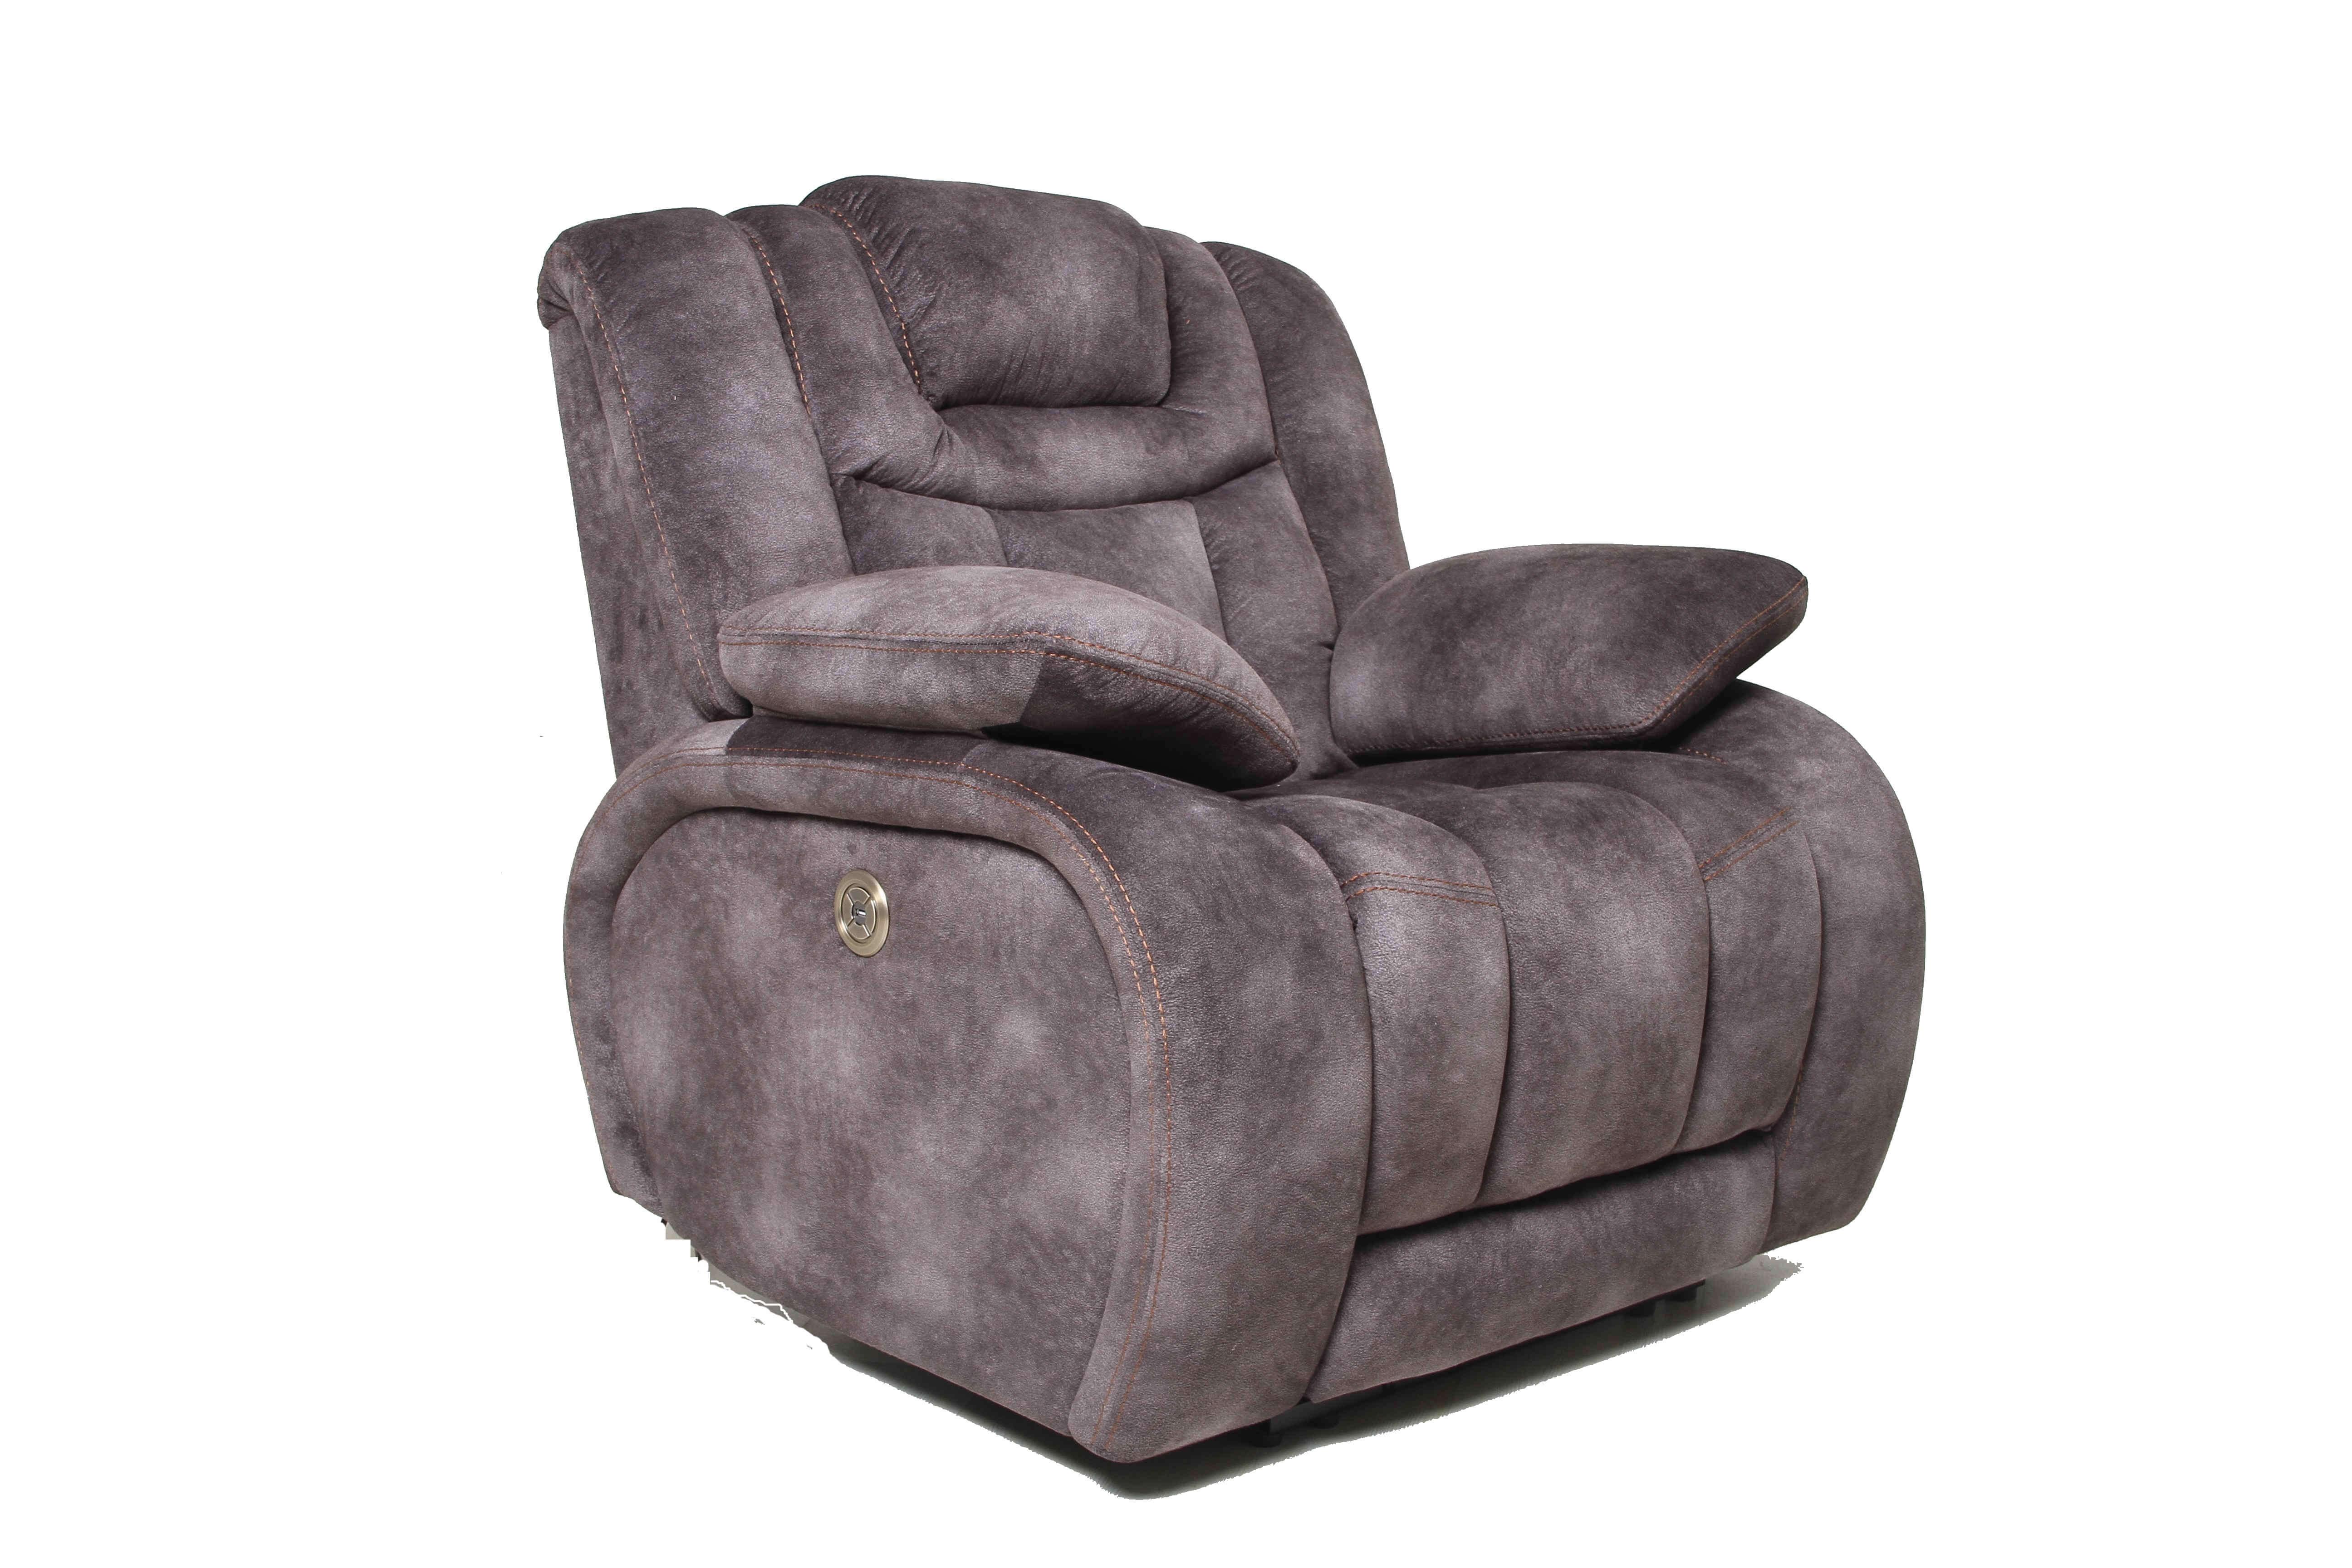 Terminator Power Dual Reclining Sofa With Adjustable Headrest